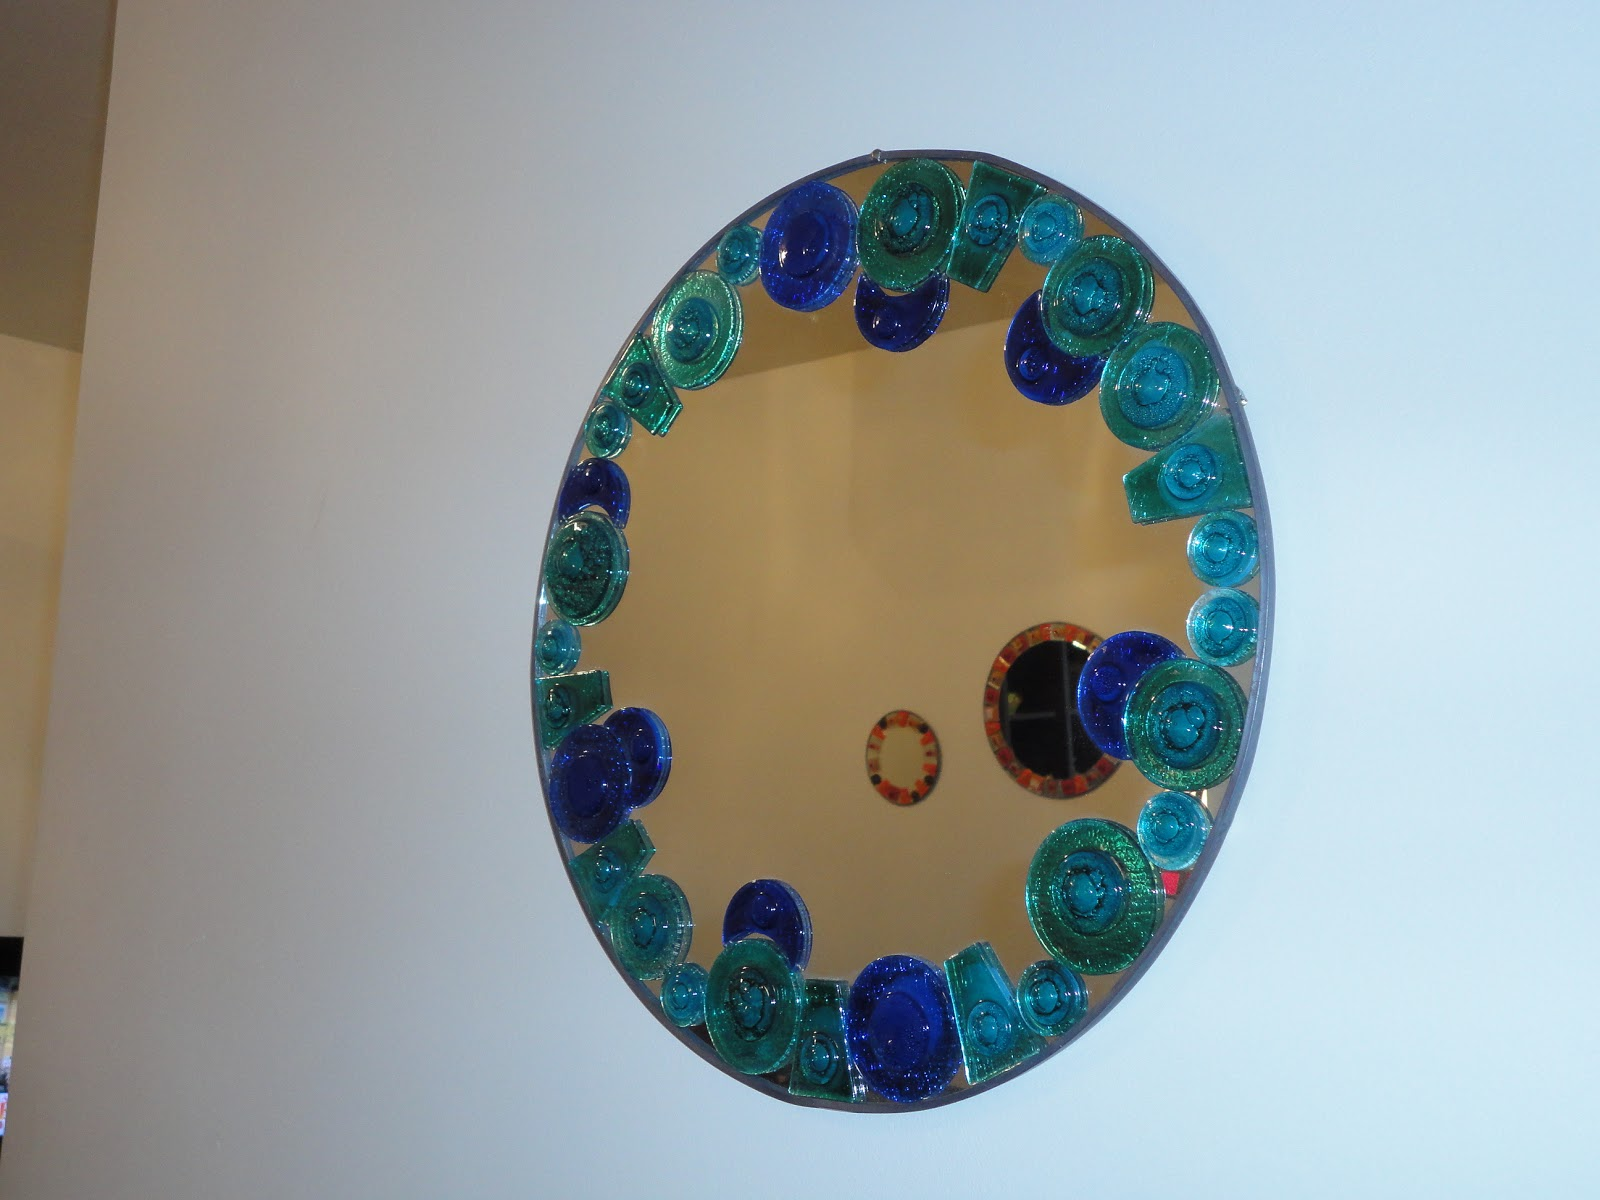 Vitro vitrofusi n taller obachi espejos circulares for Espejos circulares pared